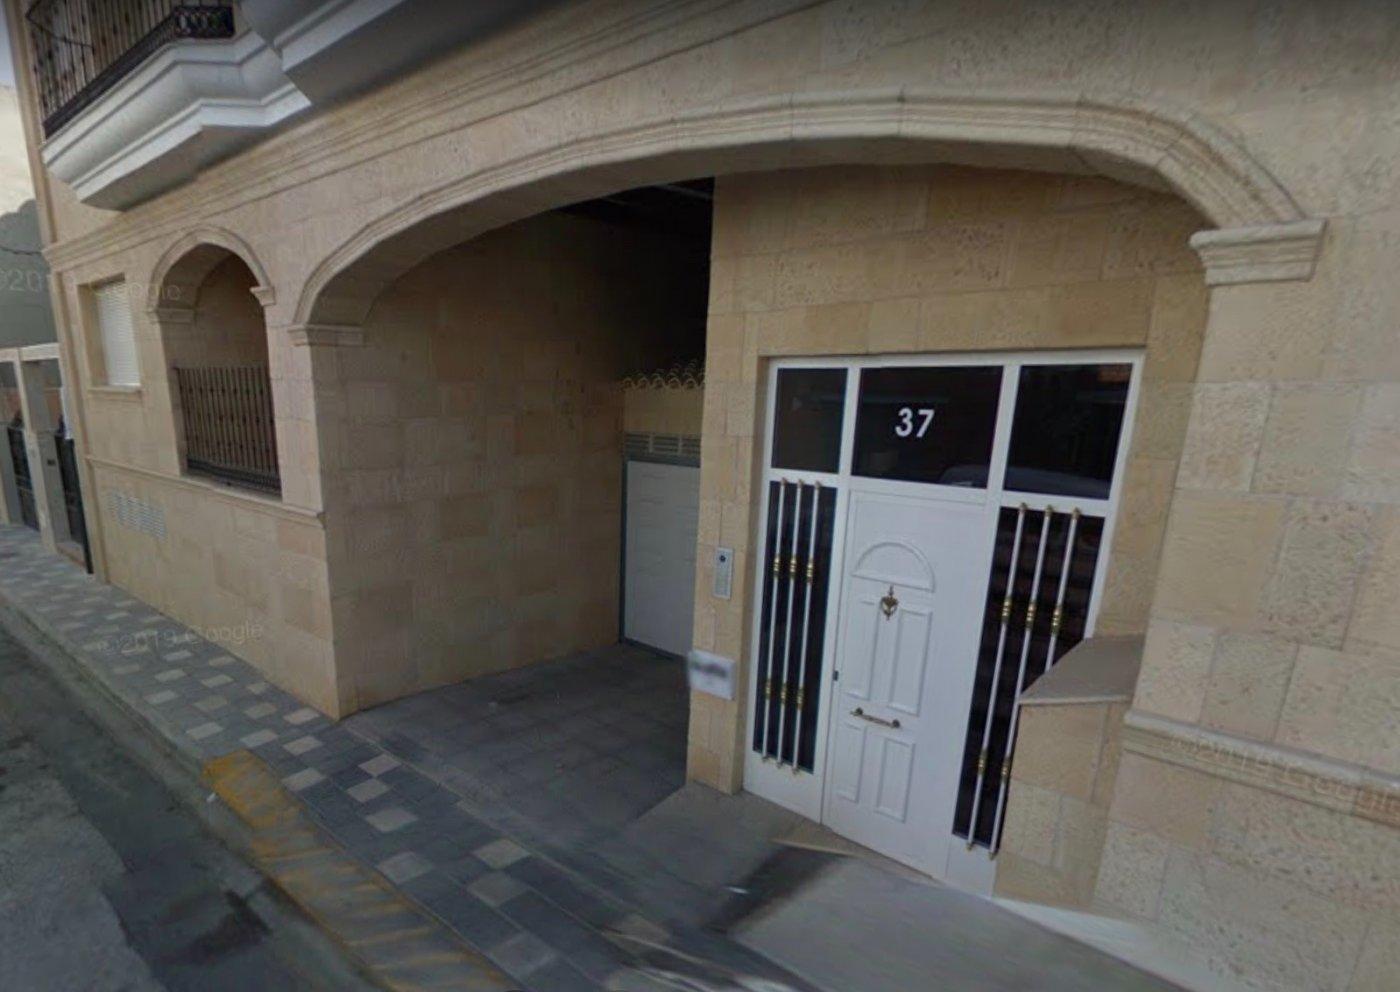 Venta de garaje en calle san roc nº 37 xeraco (valencia/valència) - imagenInmueble0